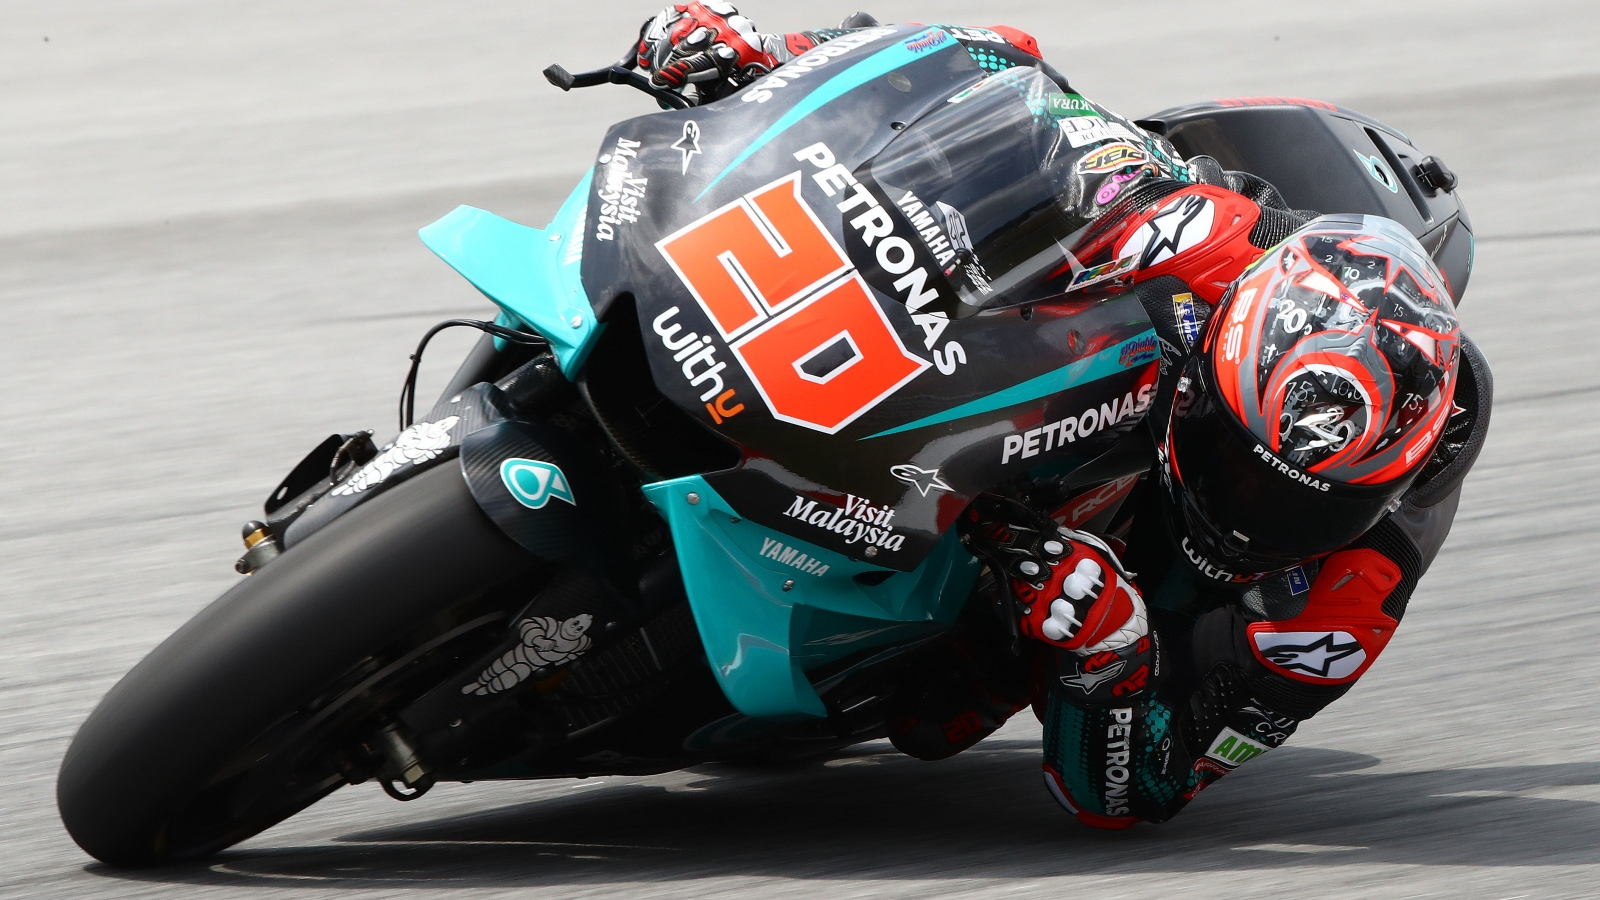 Fabio Quartararo lidera el primer día de MotoGP 2020 en el test de Sepang